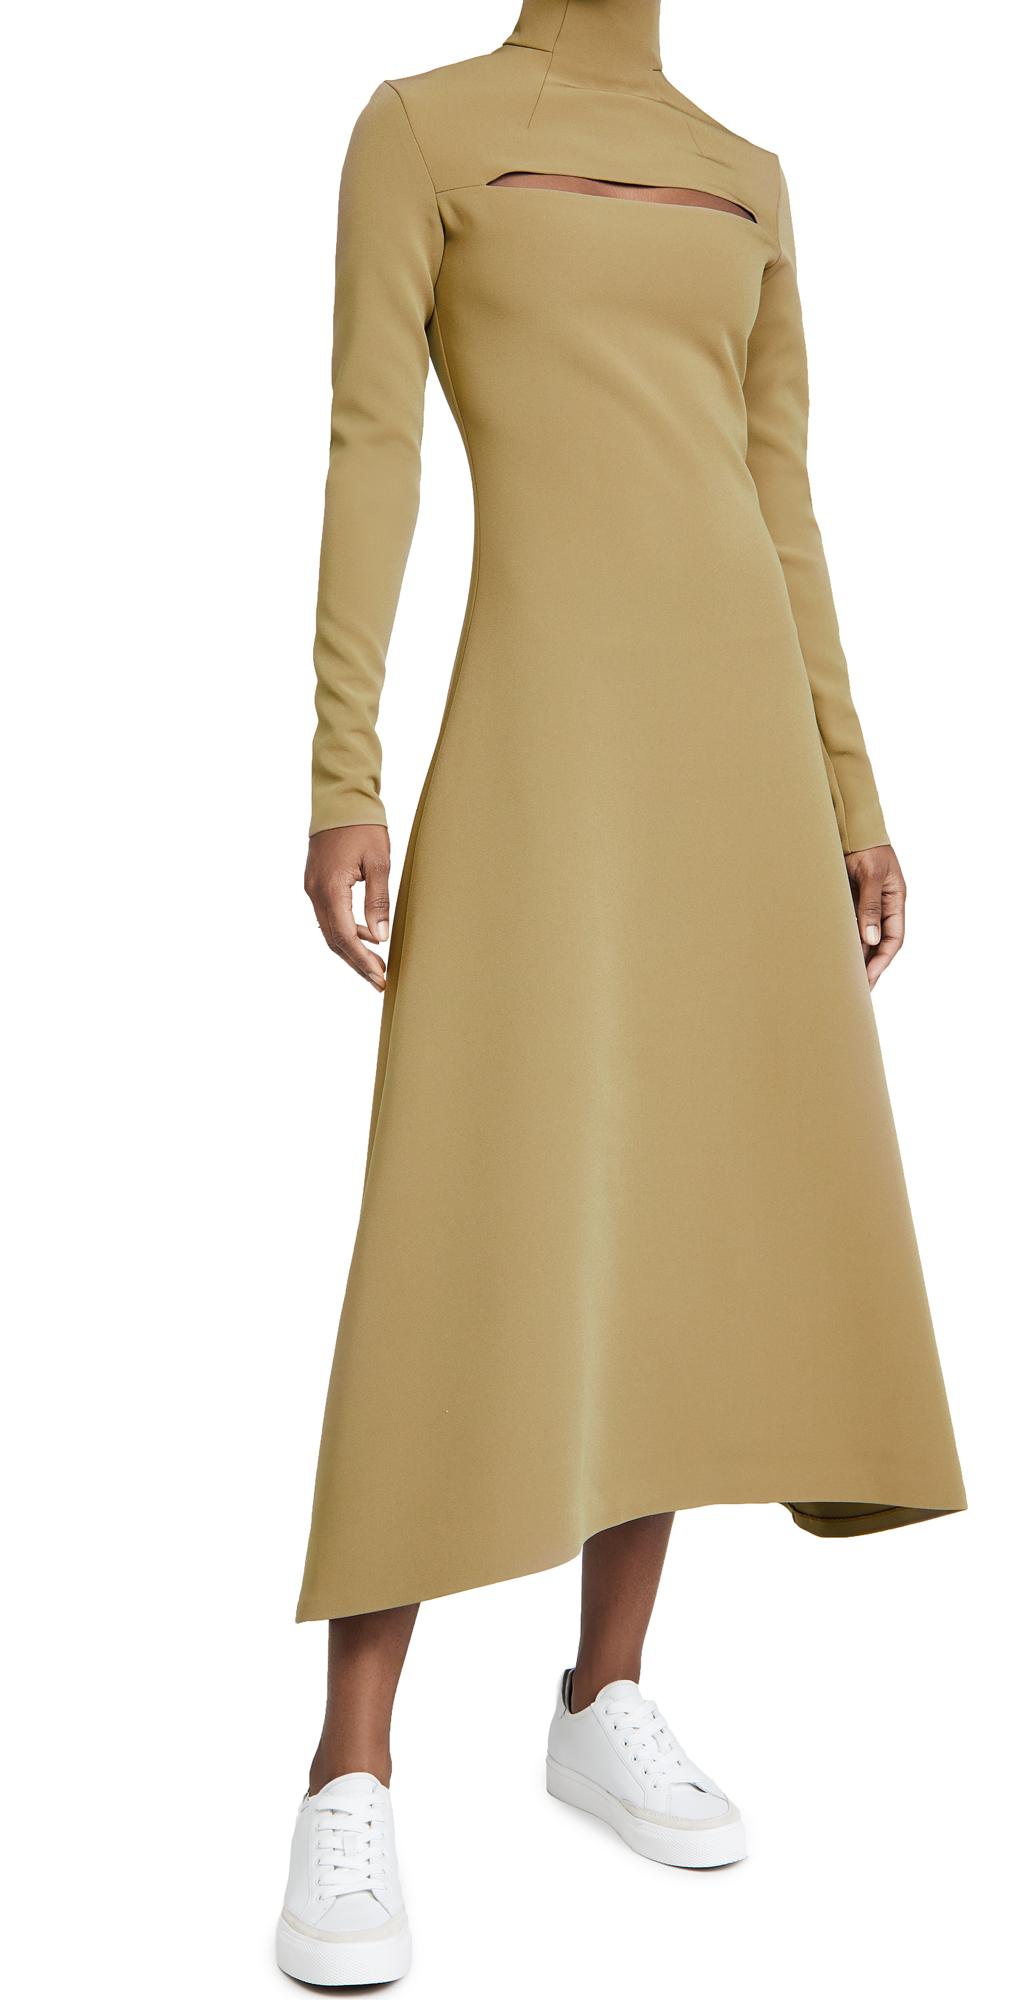 A.W.A.K.E MODE Turtleneck Dress With Cut Out